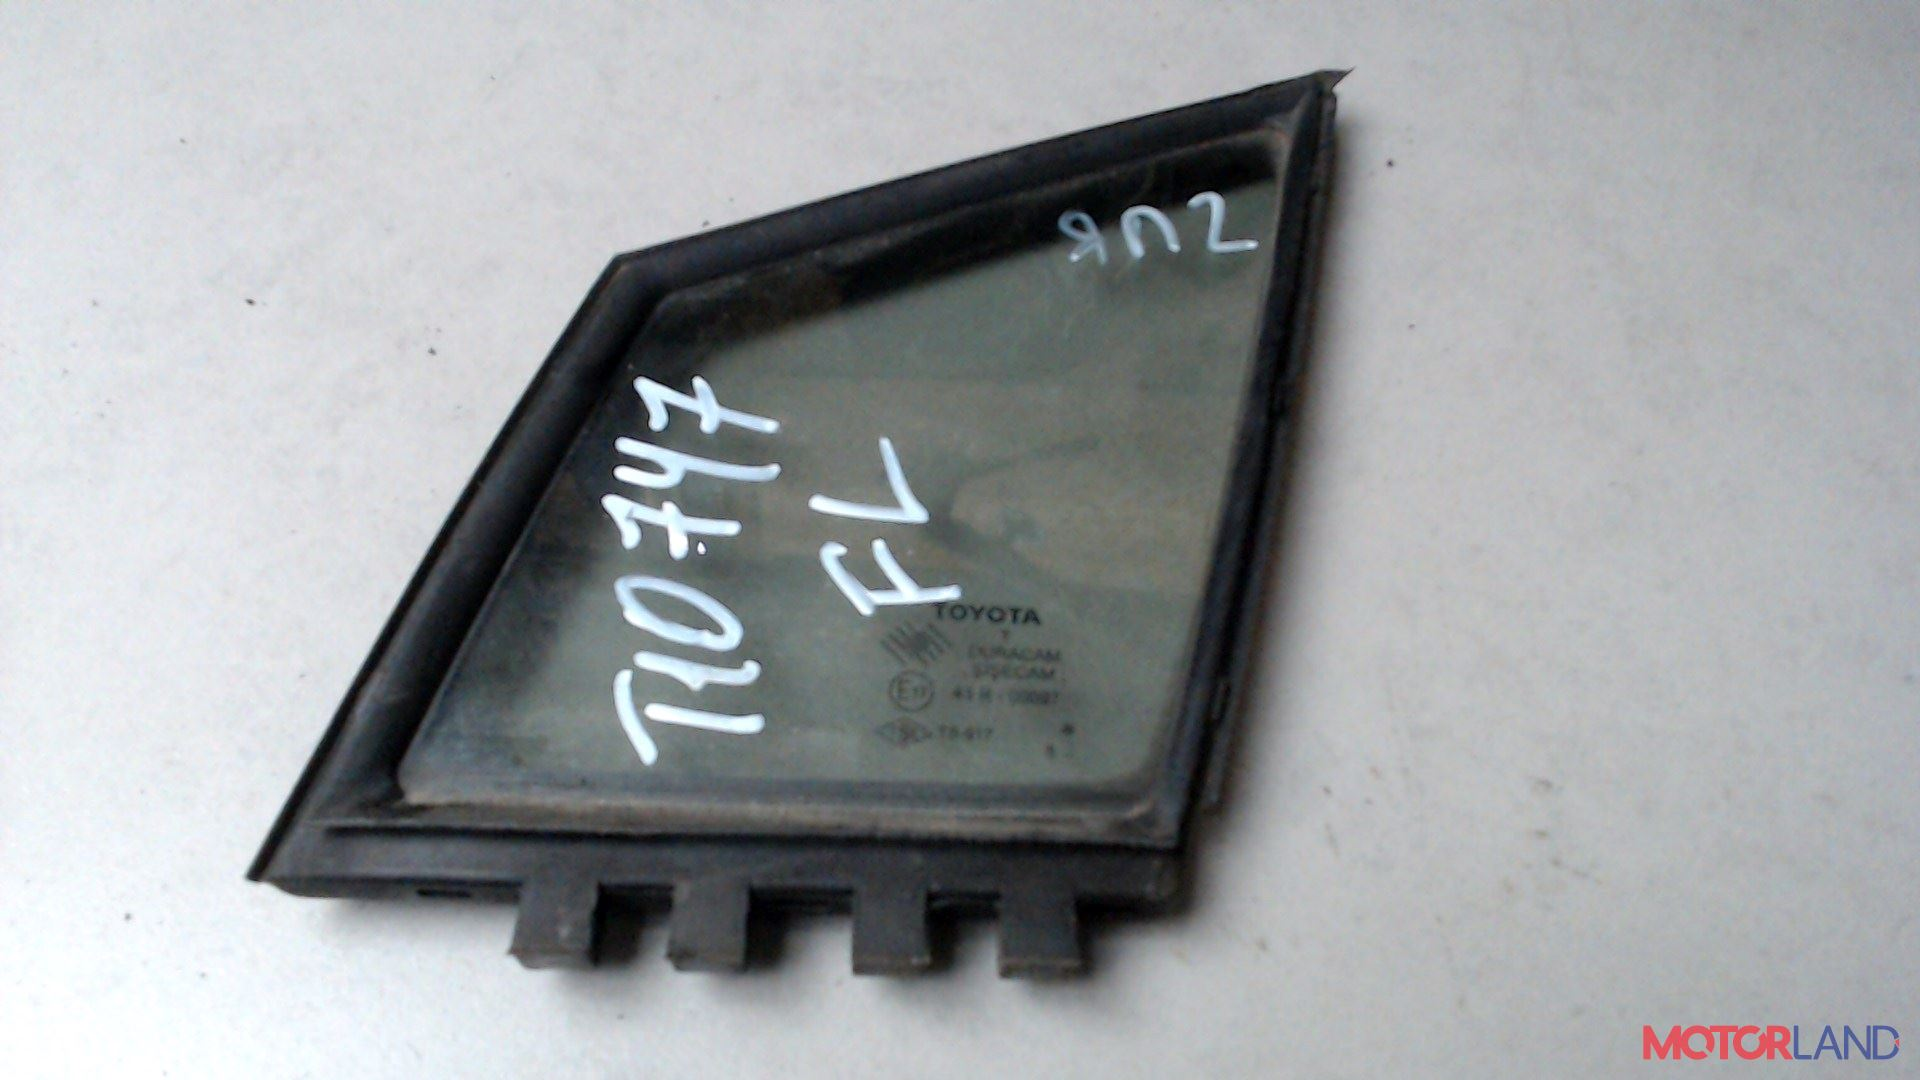 Стекло форточки двери Toyota Corolla Verso 2004-2007, Артикул 5180495 #1